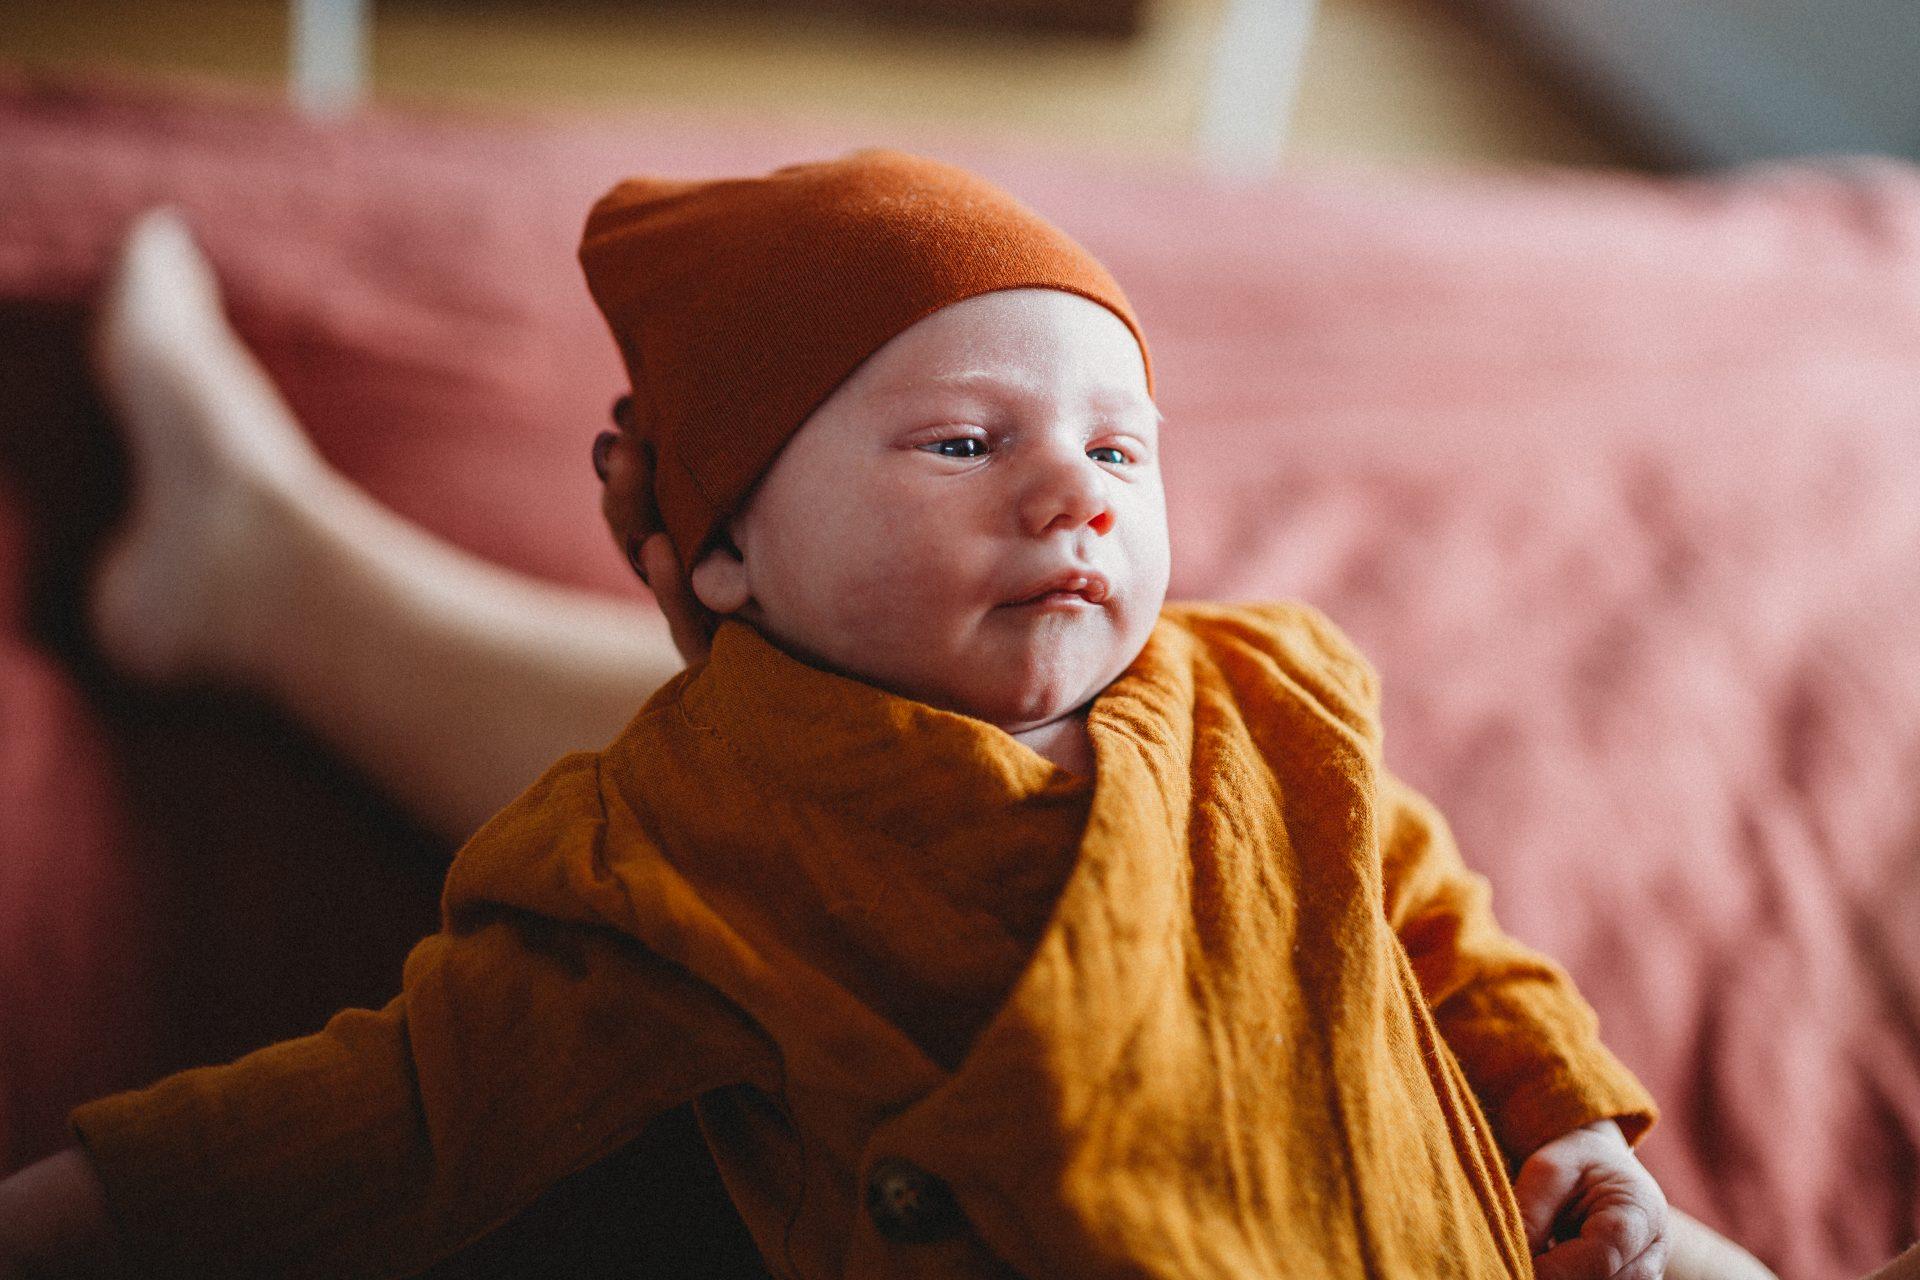 Newborn baby boy dressed in orange beanie and onesie, being held in mother's hands